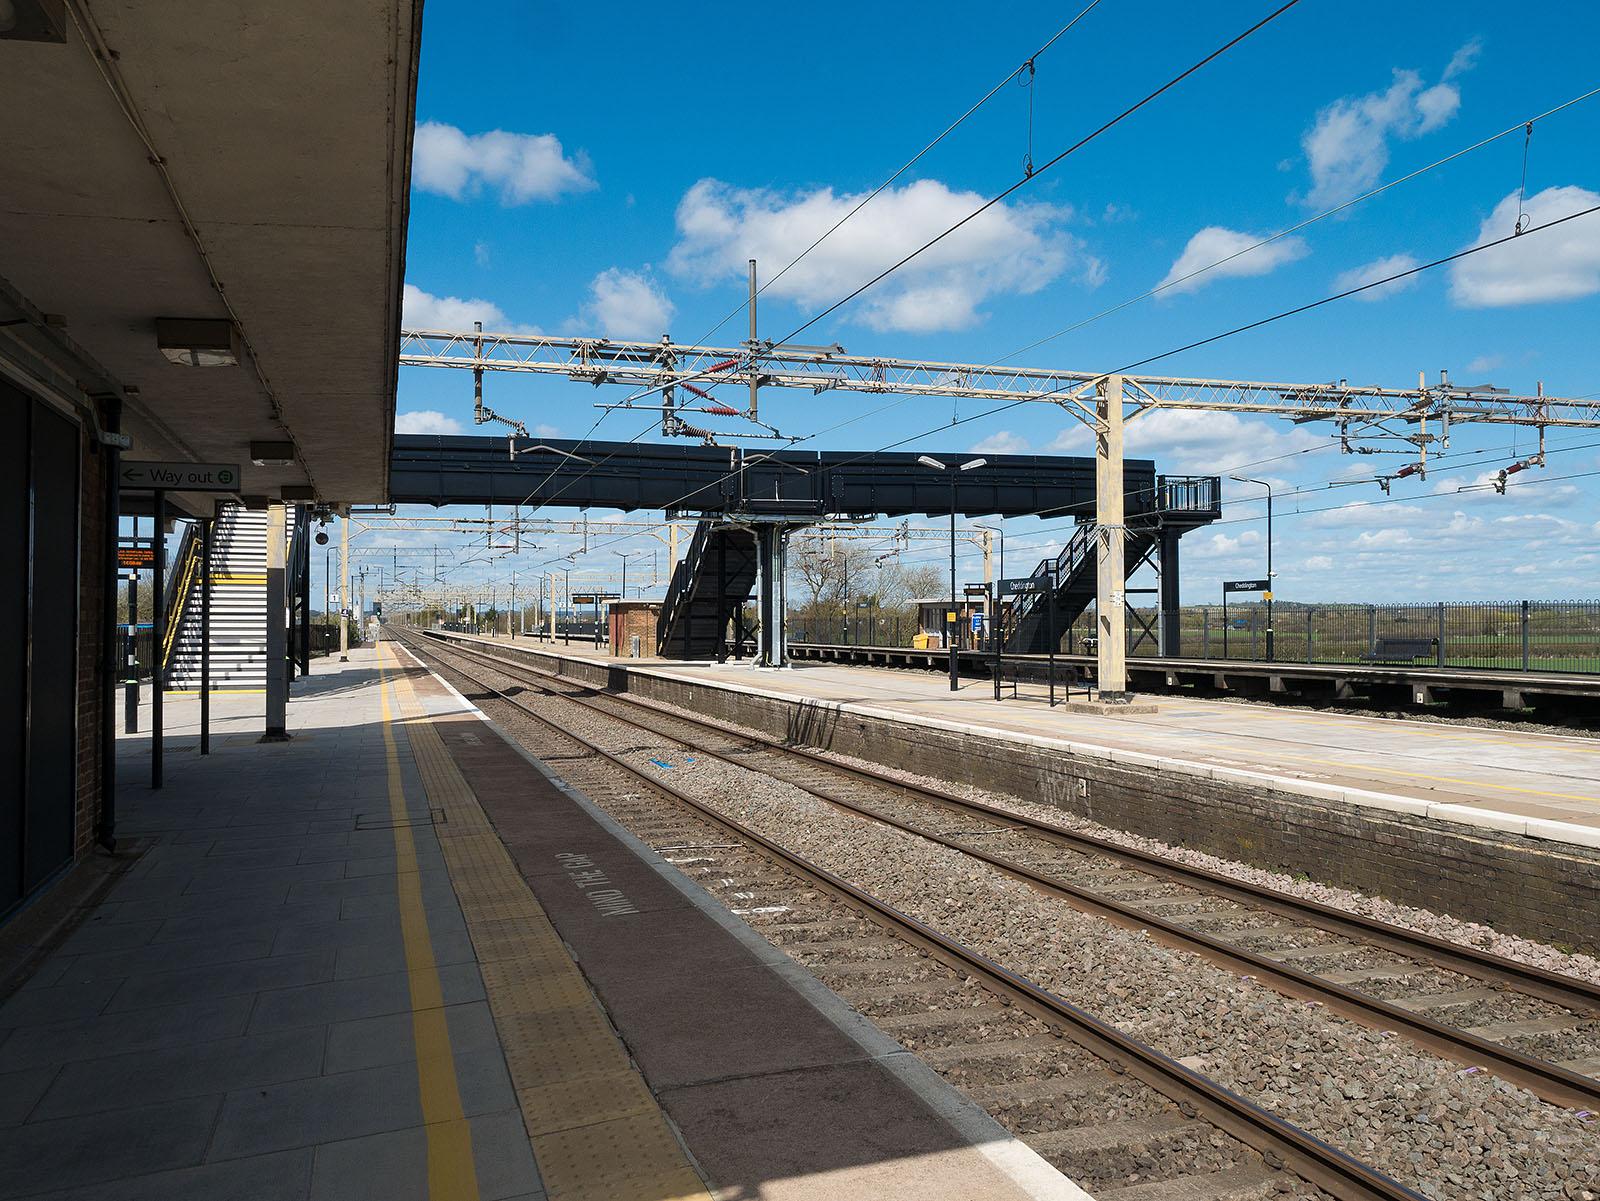 Cheddington station